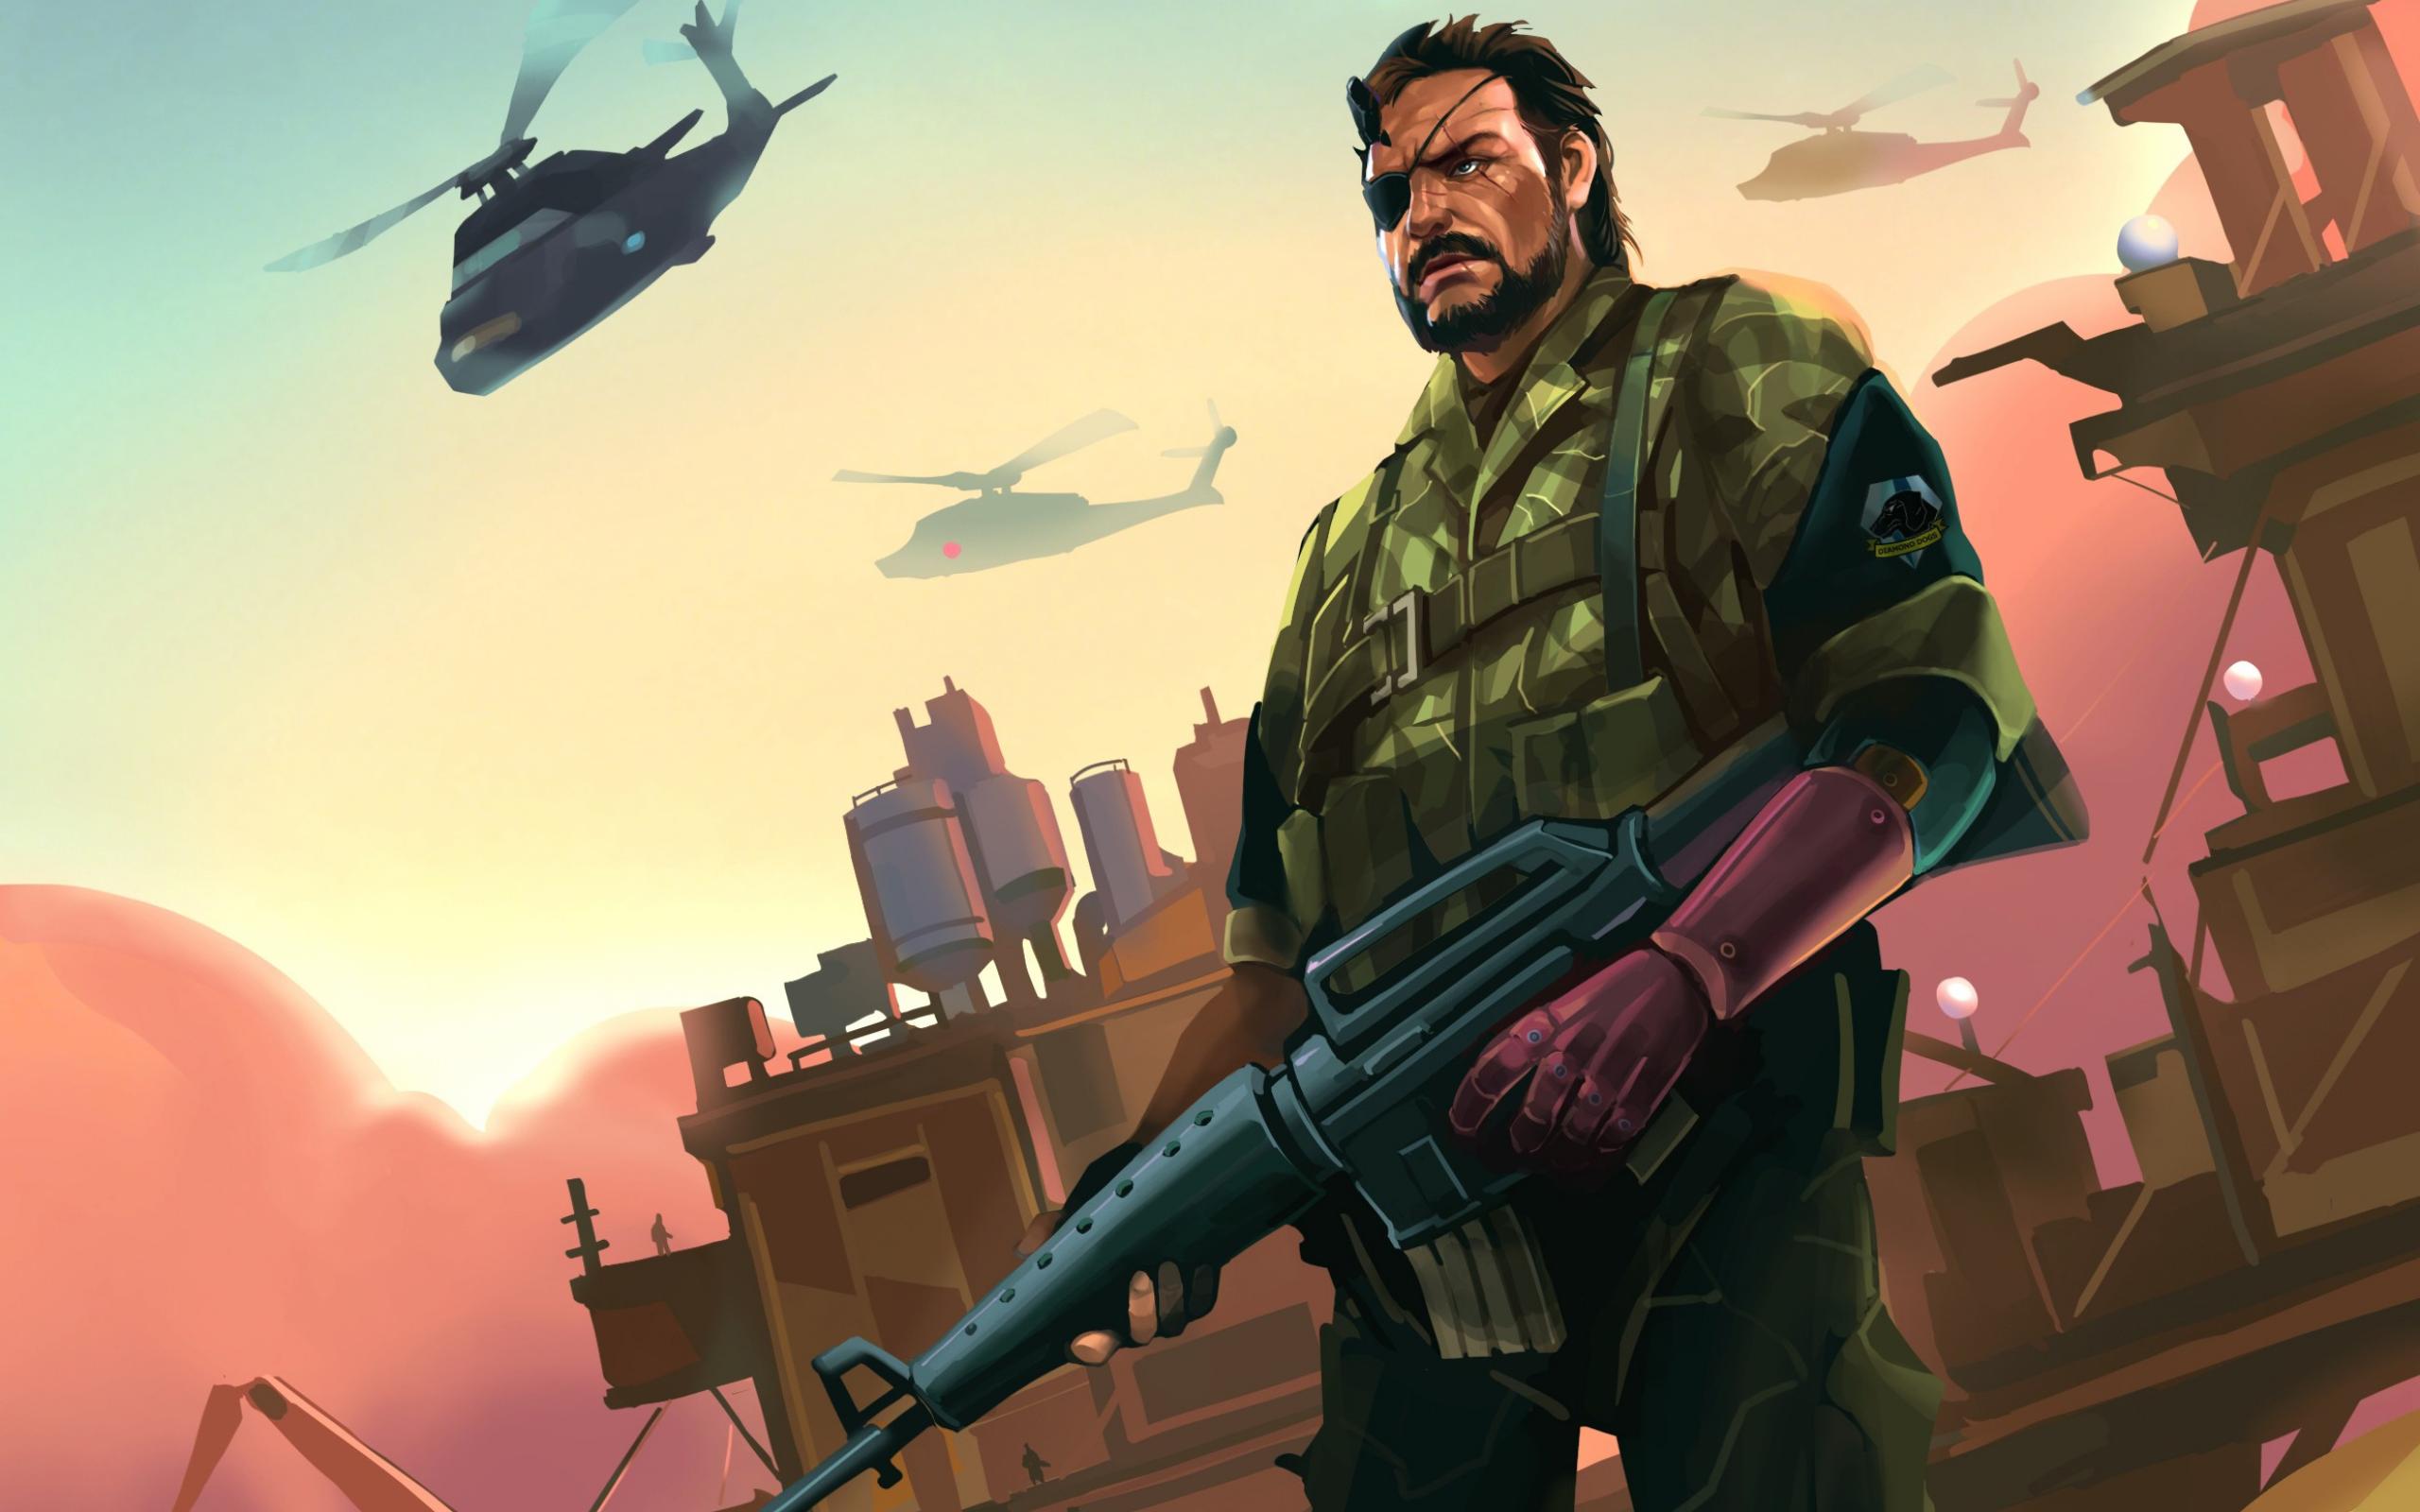 Download 2560x1600 Big Boss Metal Gear Solid 5 Video Games